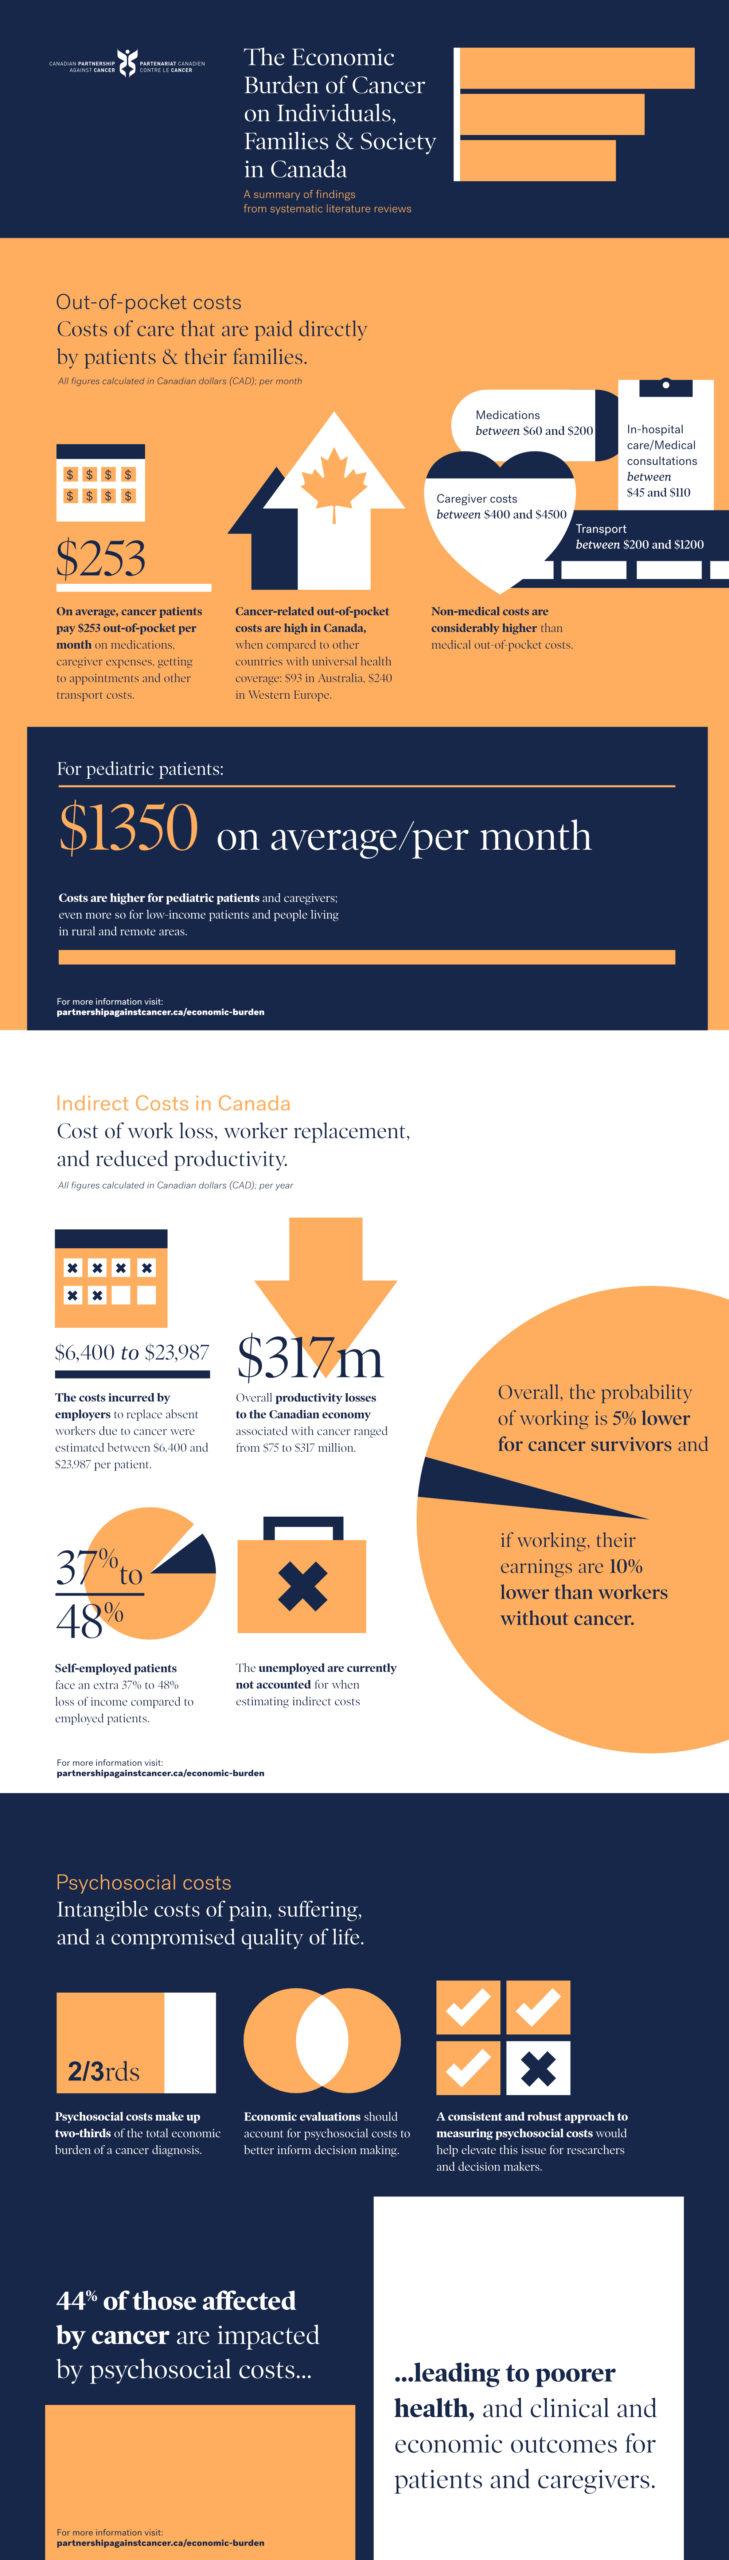 Economic burden of Cancer